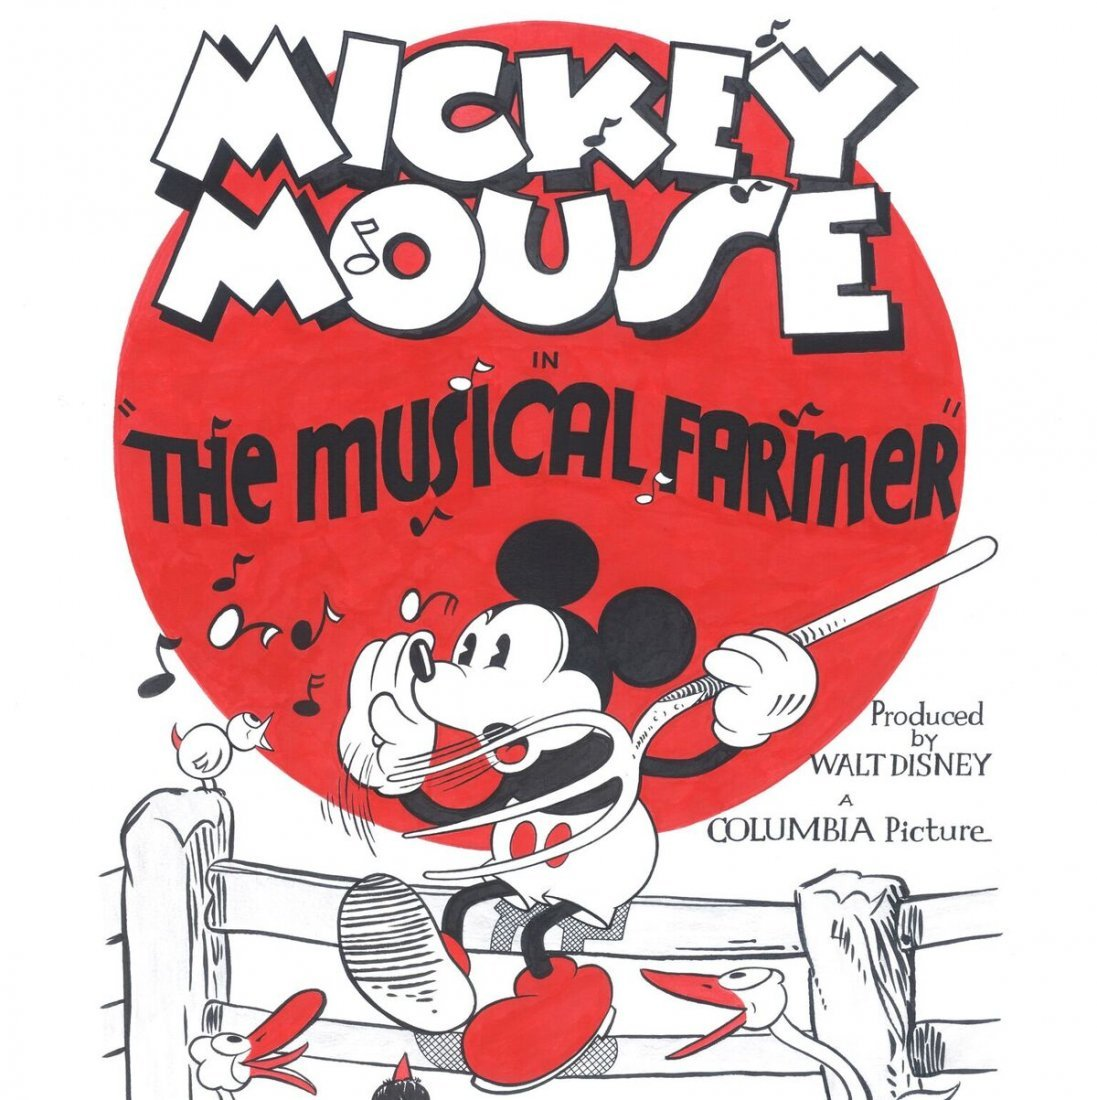 Disney Original Poster - Musical Farmer - Mickey Mouse - 2